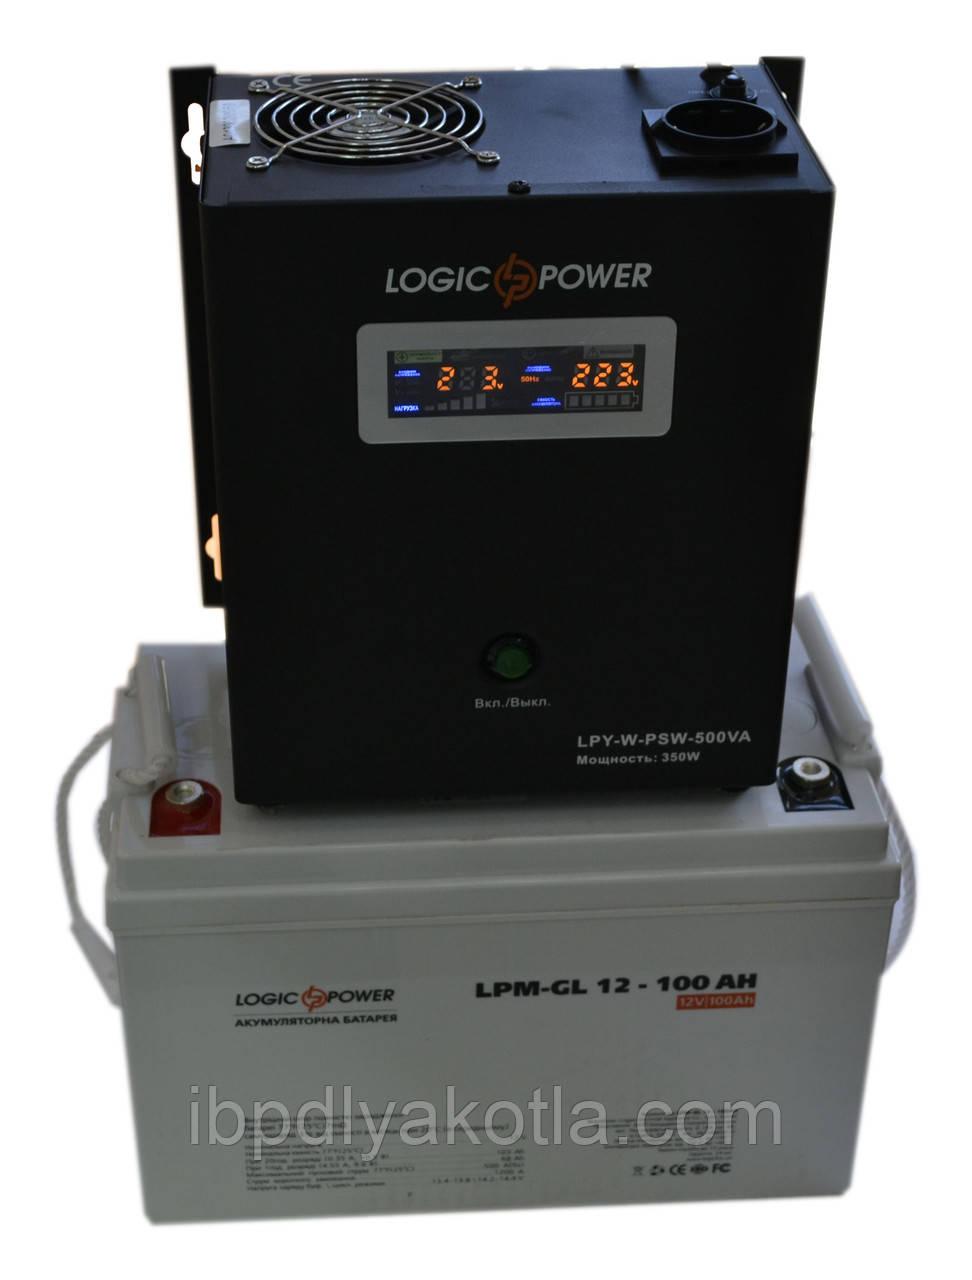 Комплект резервного питания ИБП Logicpower LPY-W-PSW-500 + АКБ LP-GL100 для 7-12ч работы газового котла